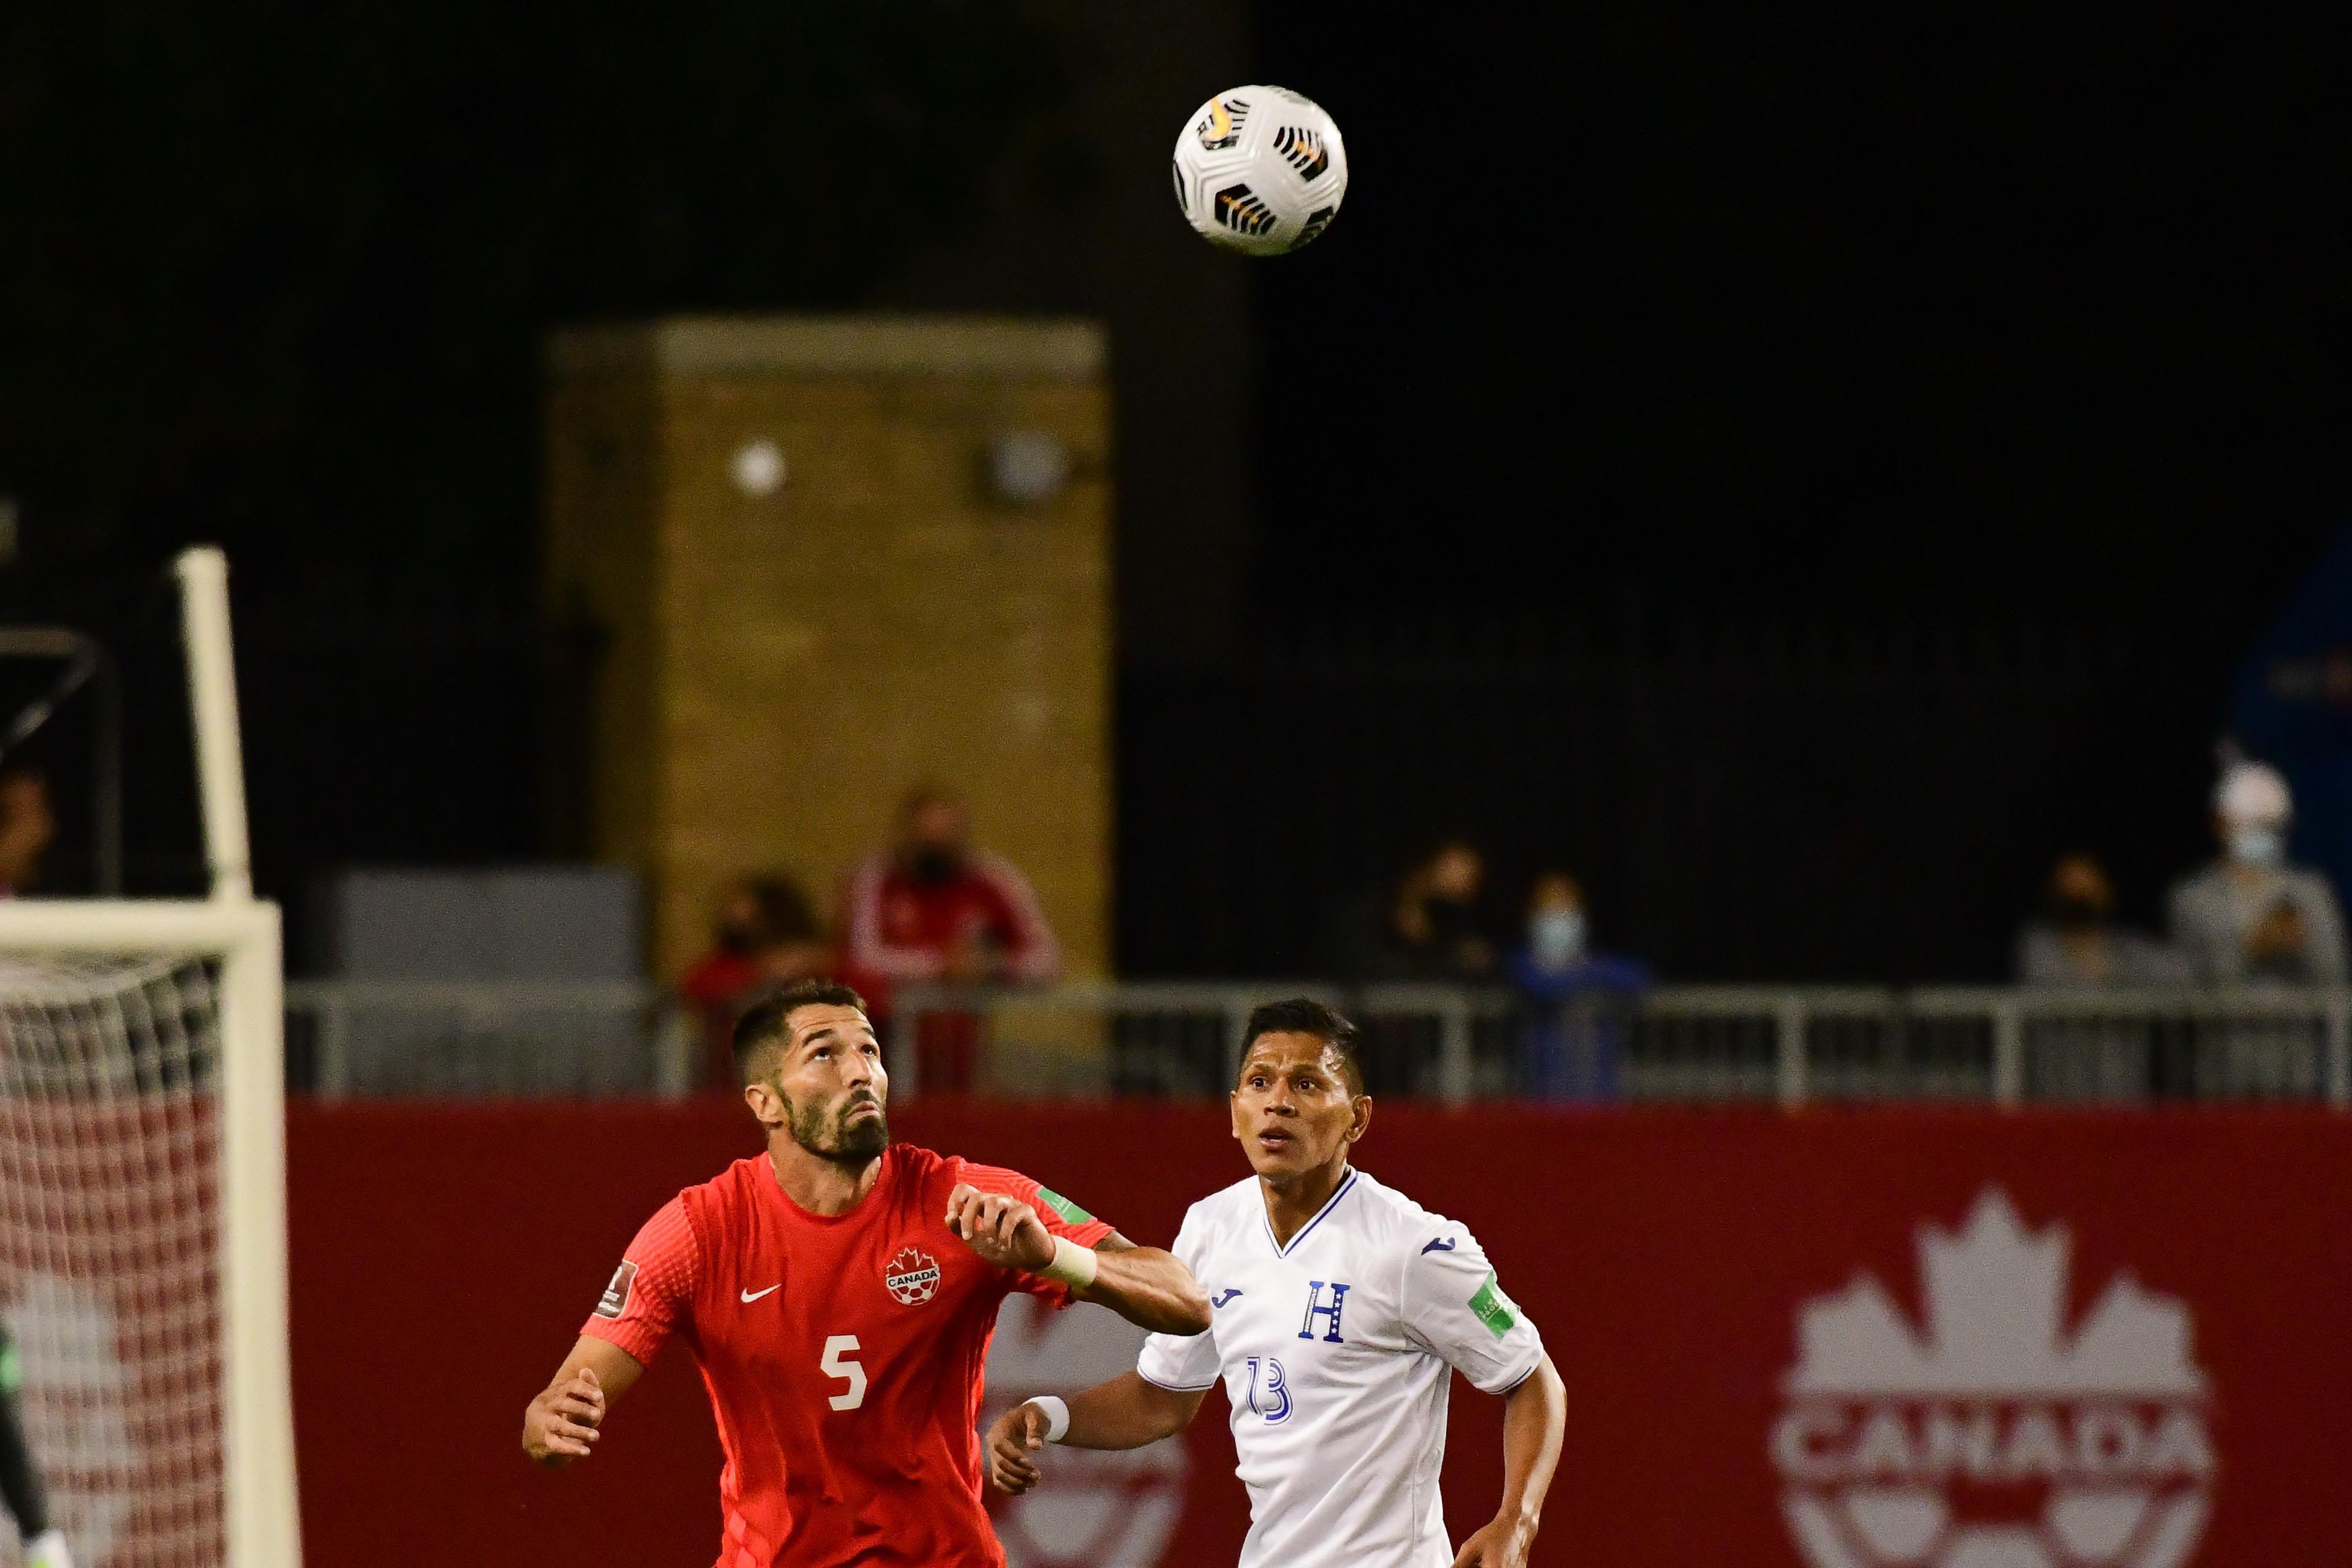 Steven Vitória battles Brayan Moya for the ball. (Canada Soccer/Martin Bazyl)